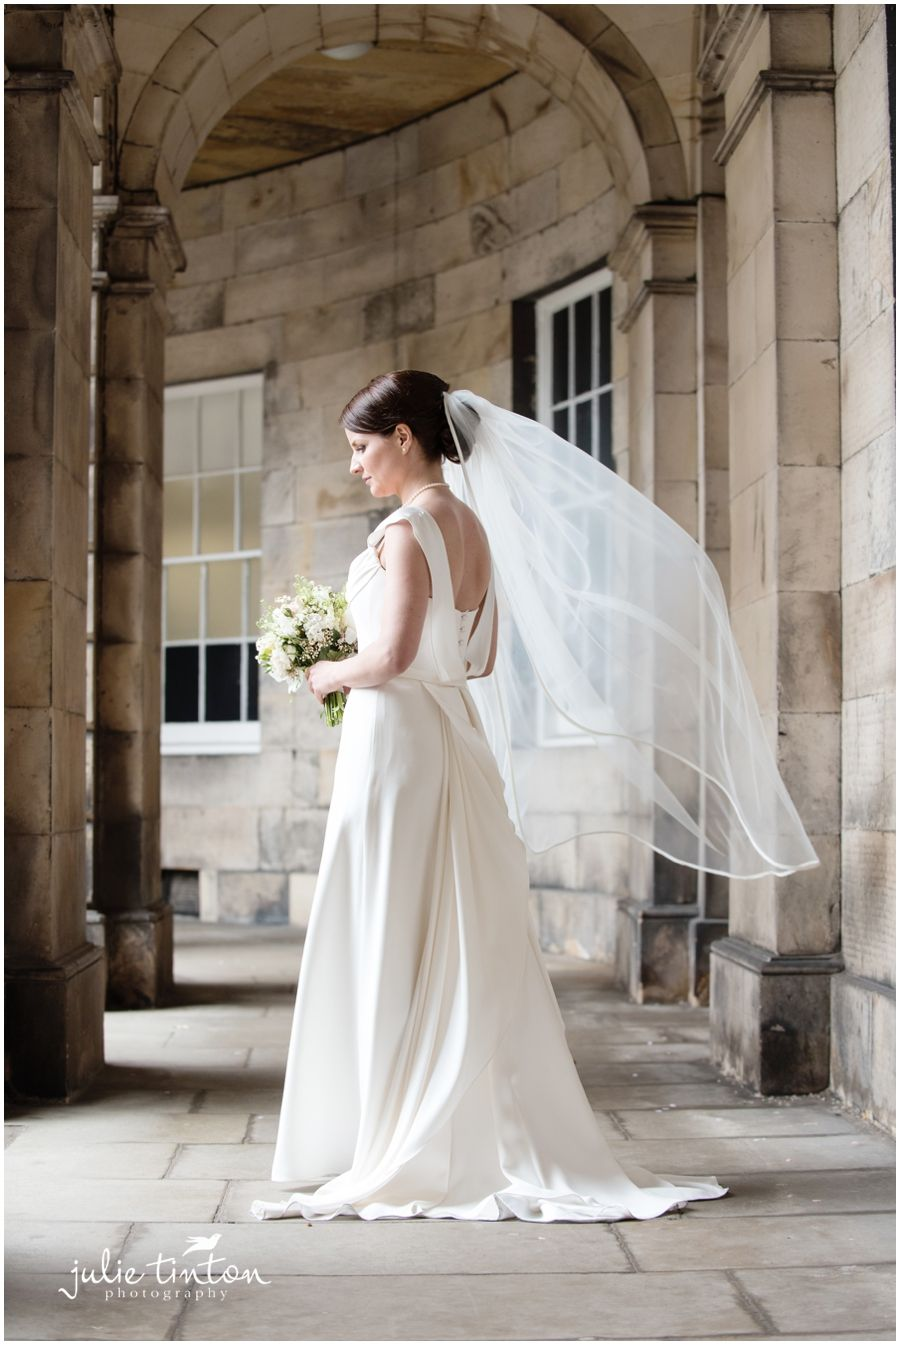 Signet Library, Wedding, Bride, Edinburgh Wedding Photographer Julie ...